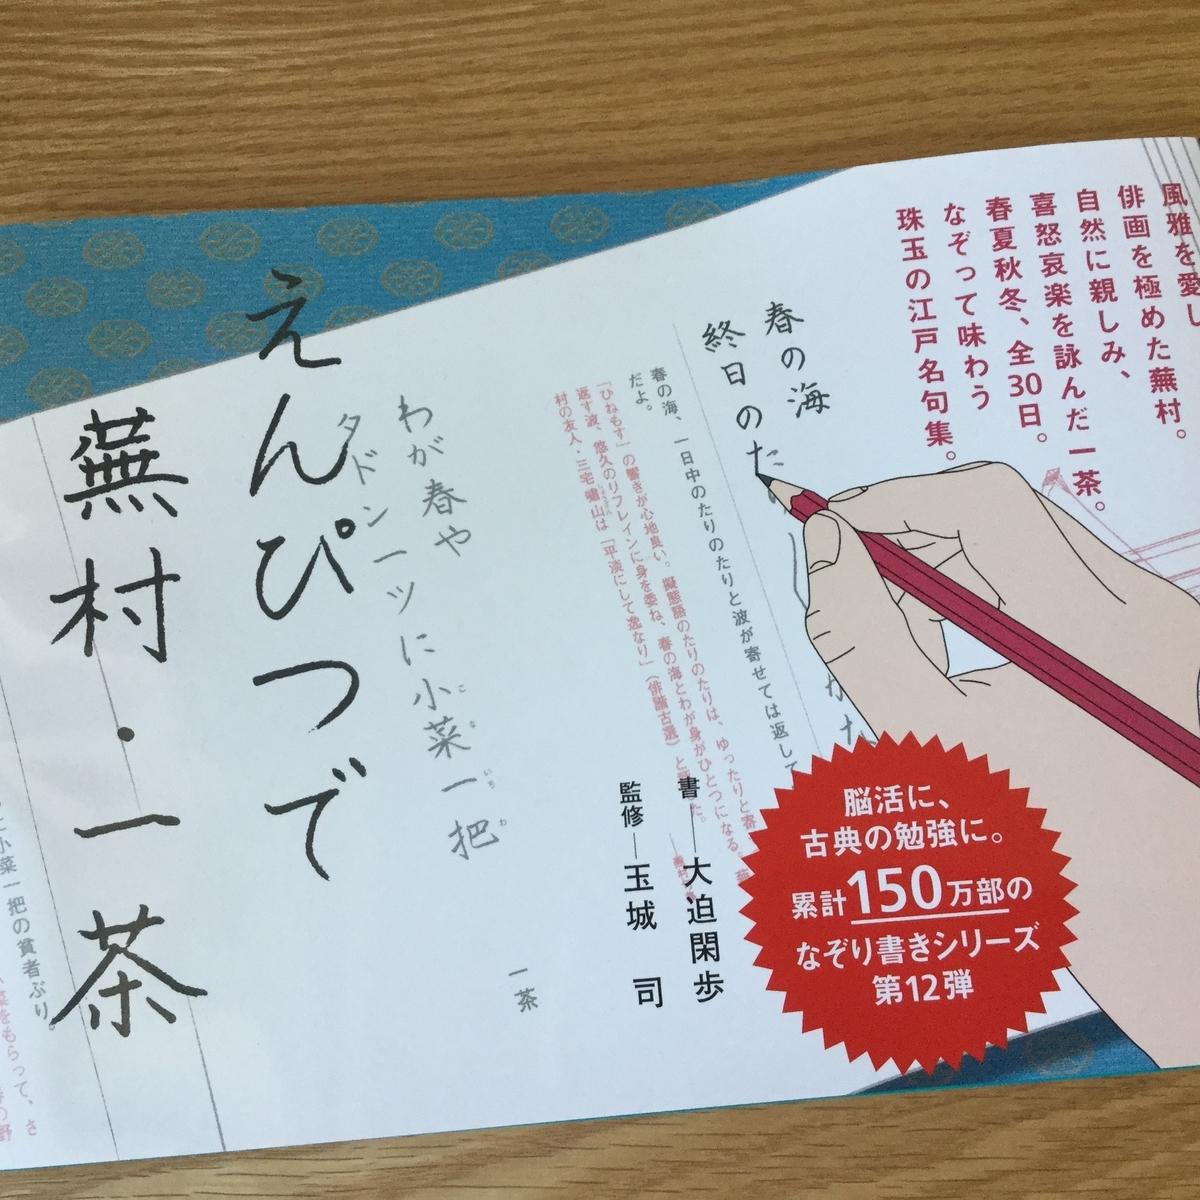 鉛筆 綺麗な字 与謝蕪村 小林一茶 練習